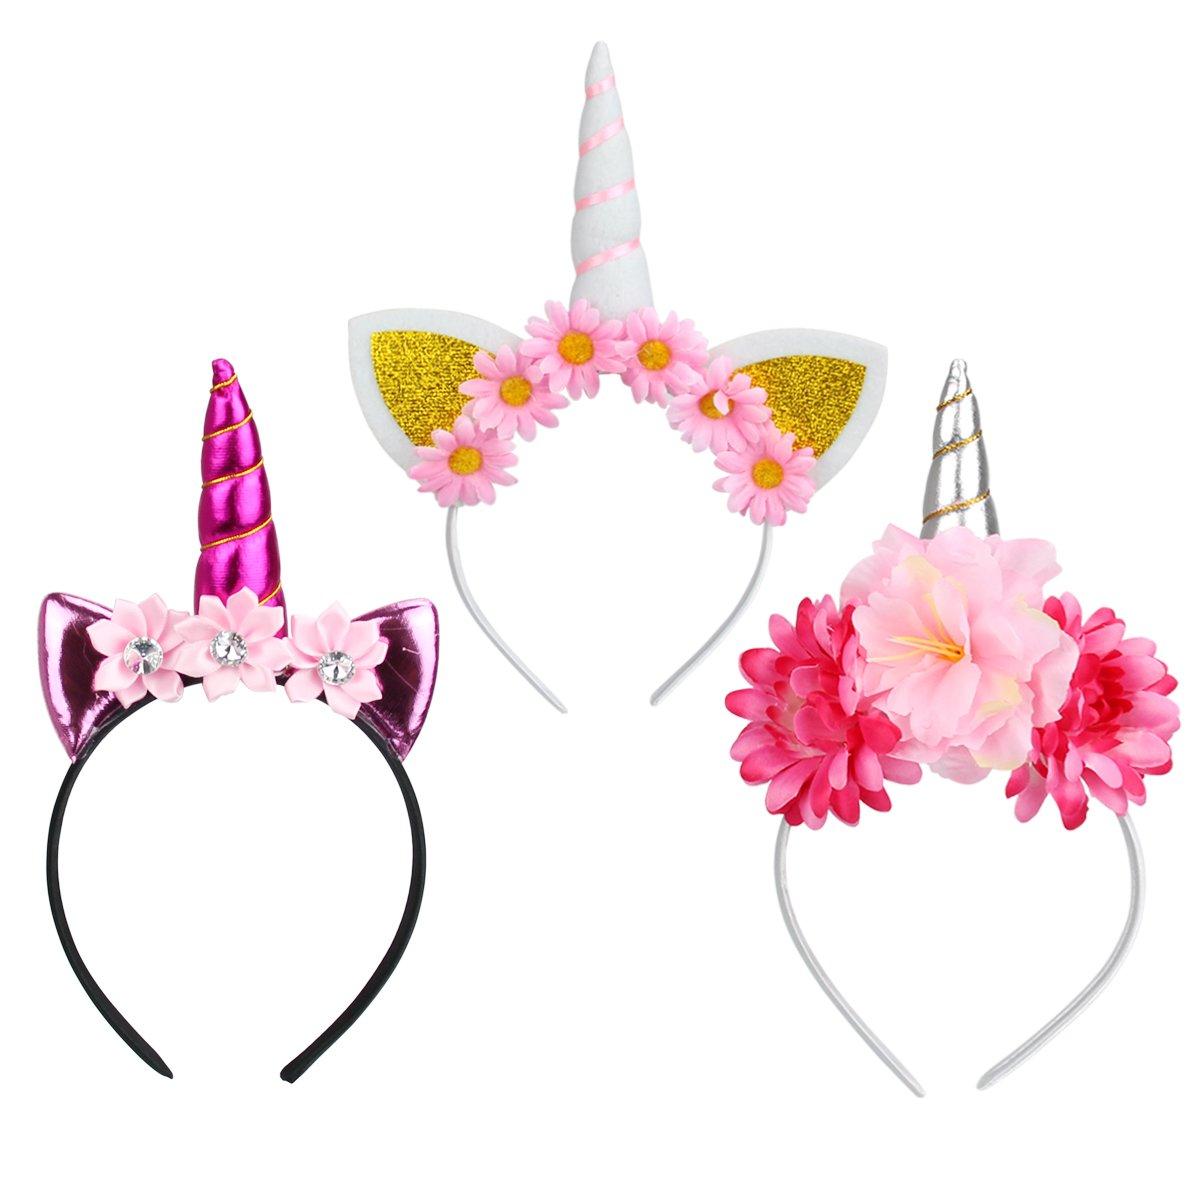 Diadema unicornio Unicornio Cuerno Diadema con Flores Artificiales Accesorio de Pelo para